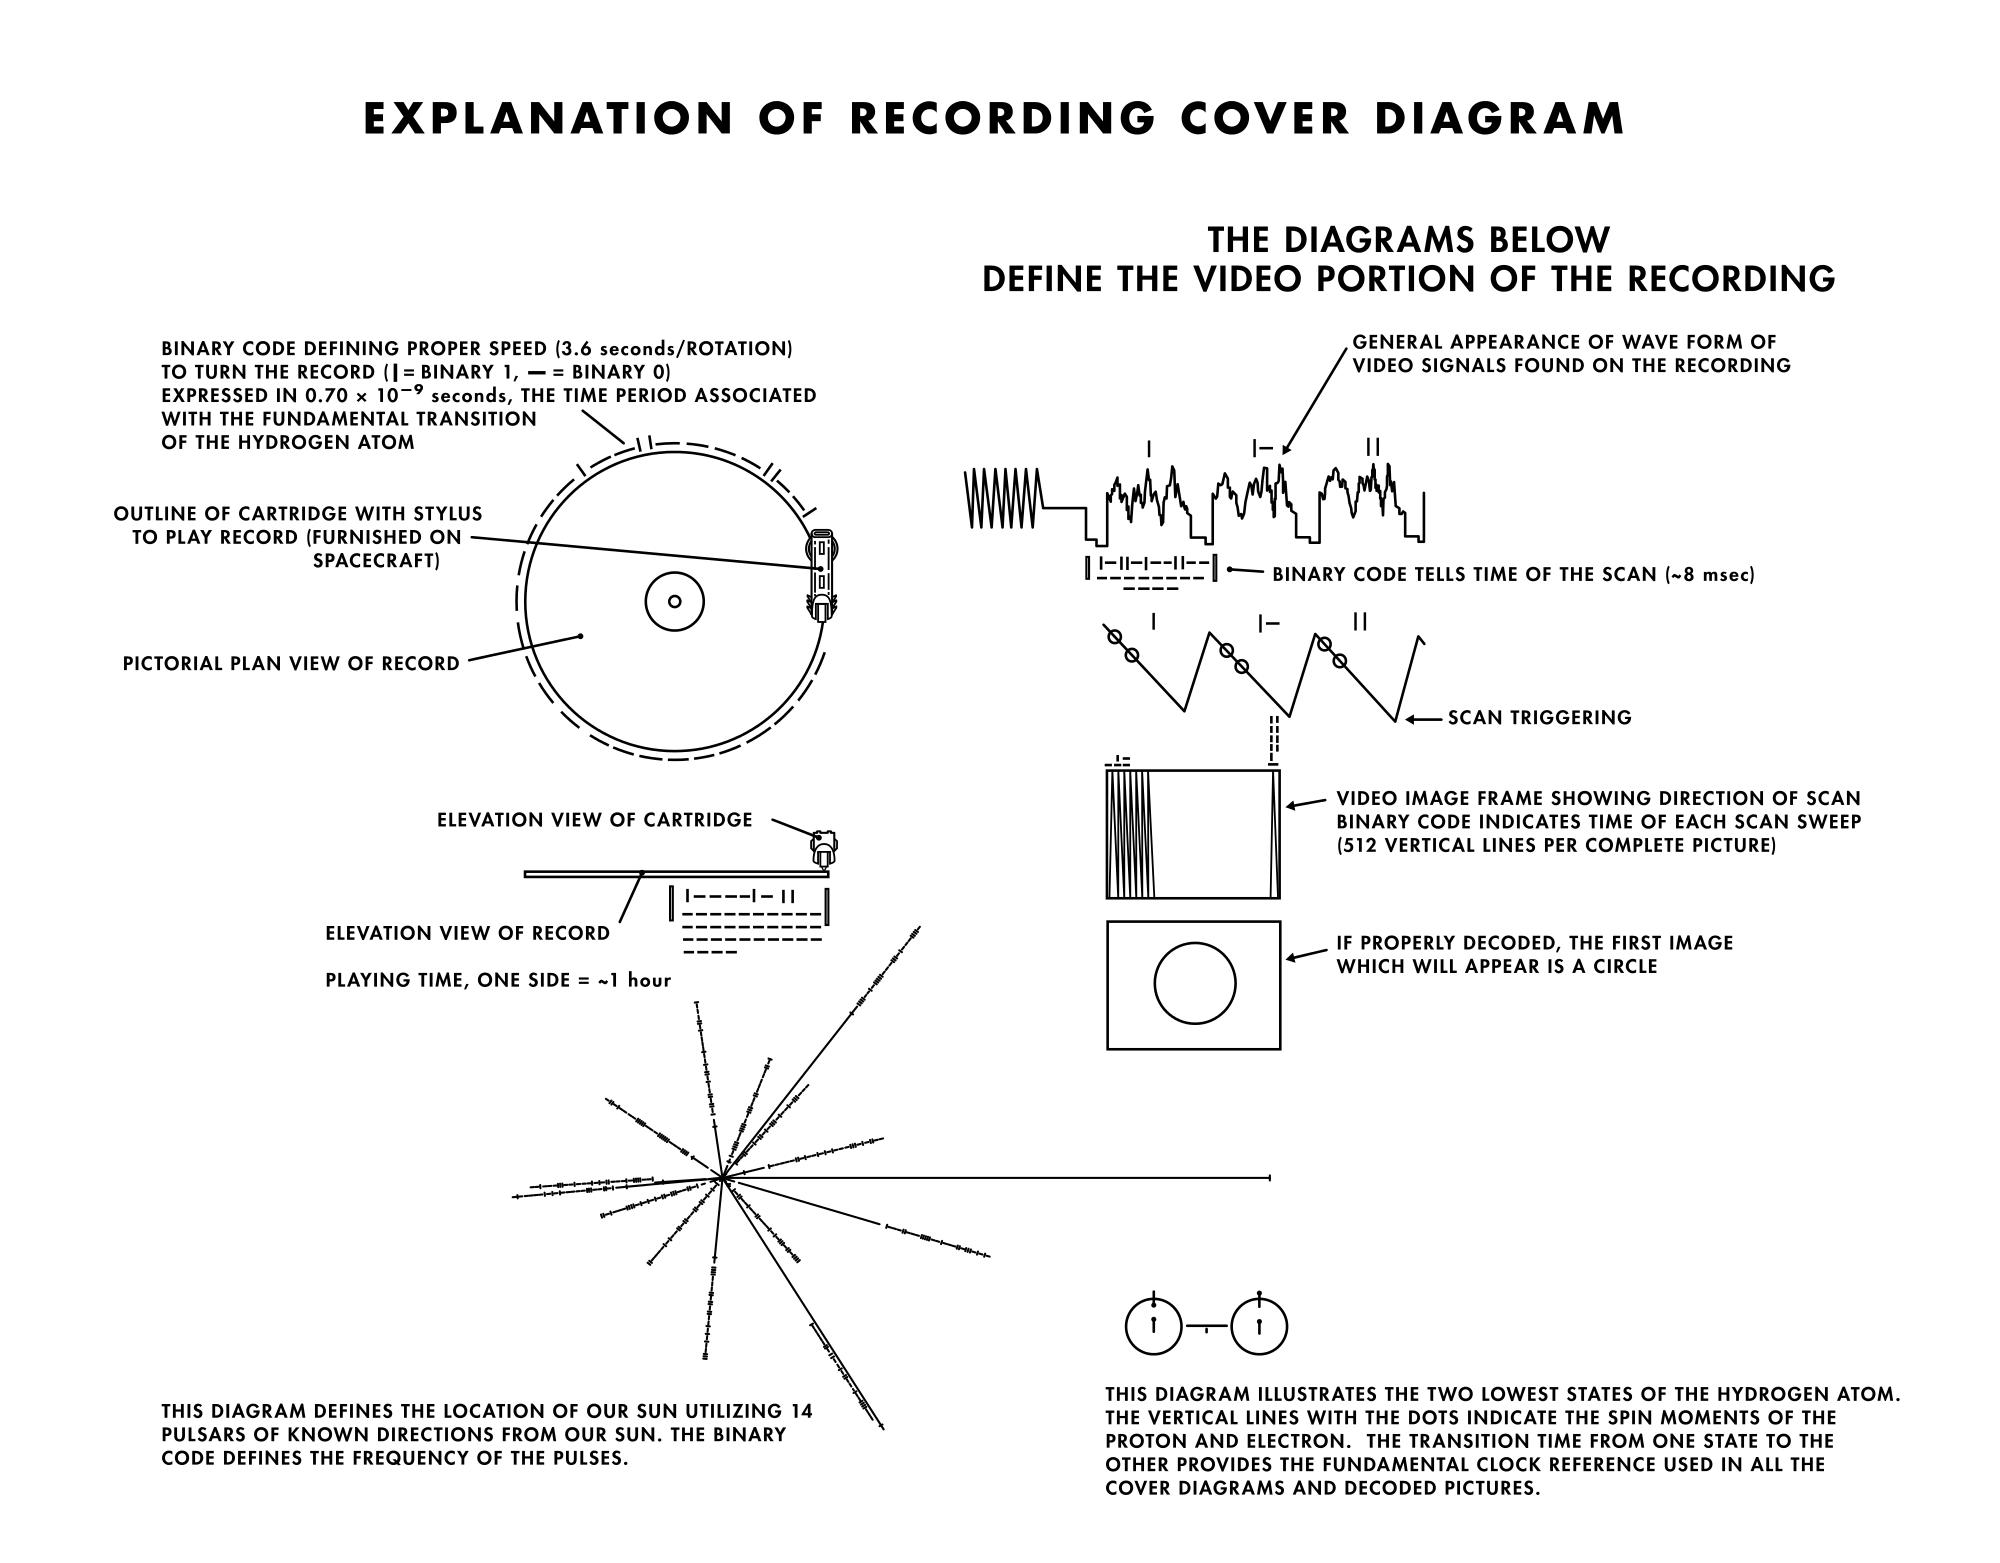 Discul aurit de pe Voyager, coperta cu explicatii